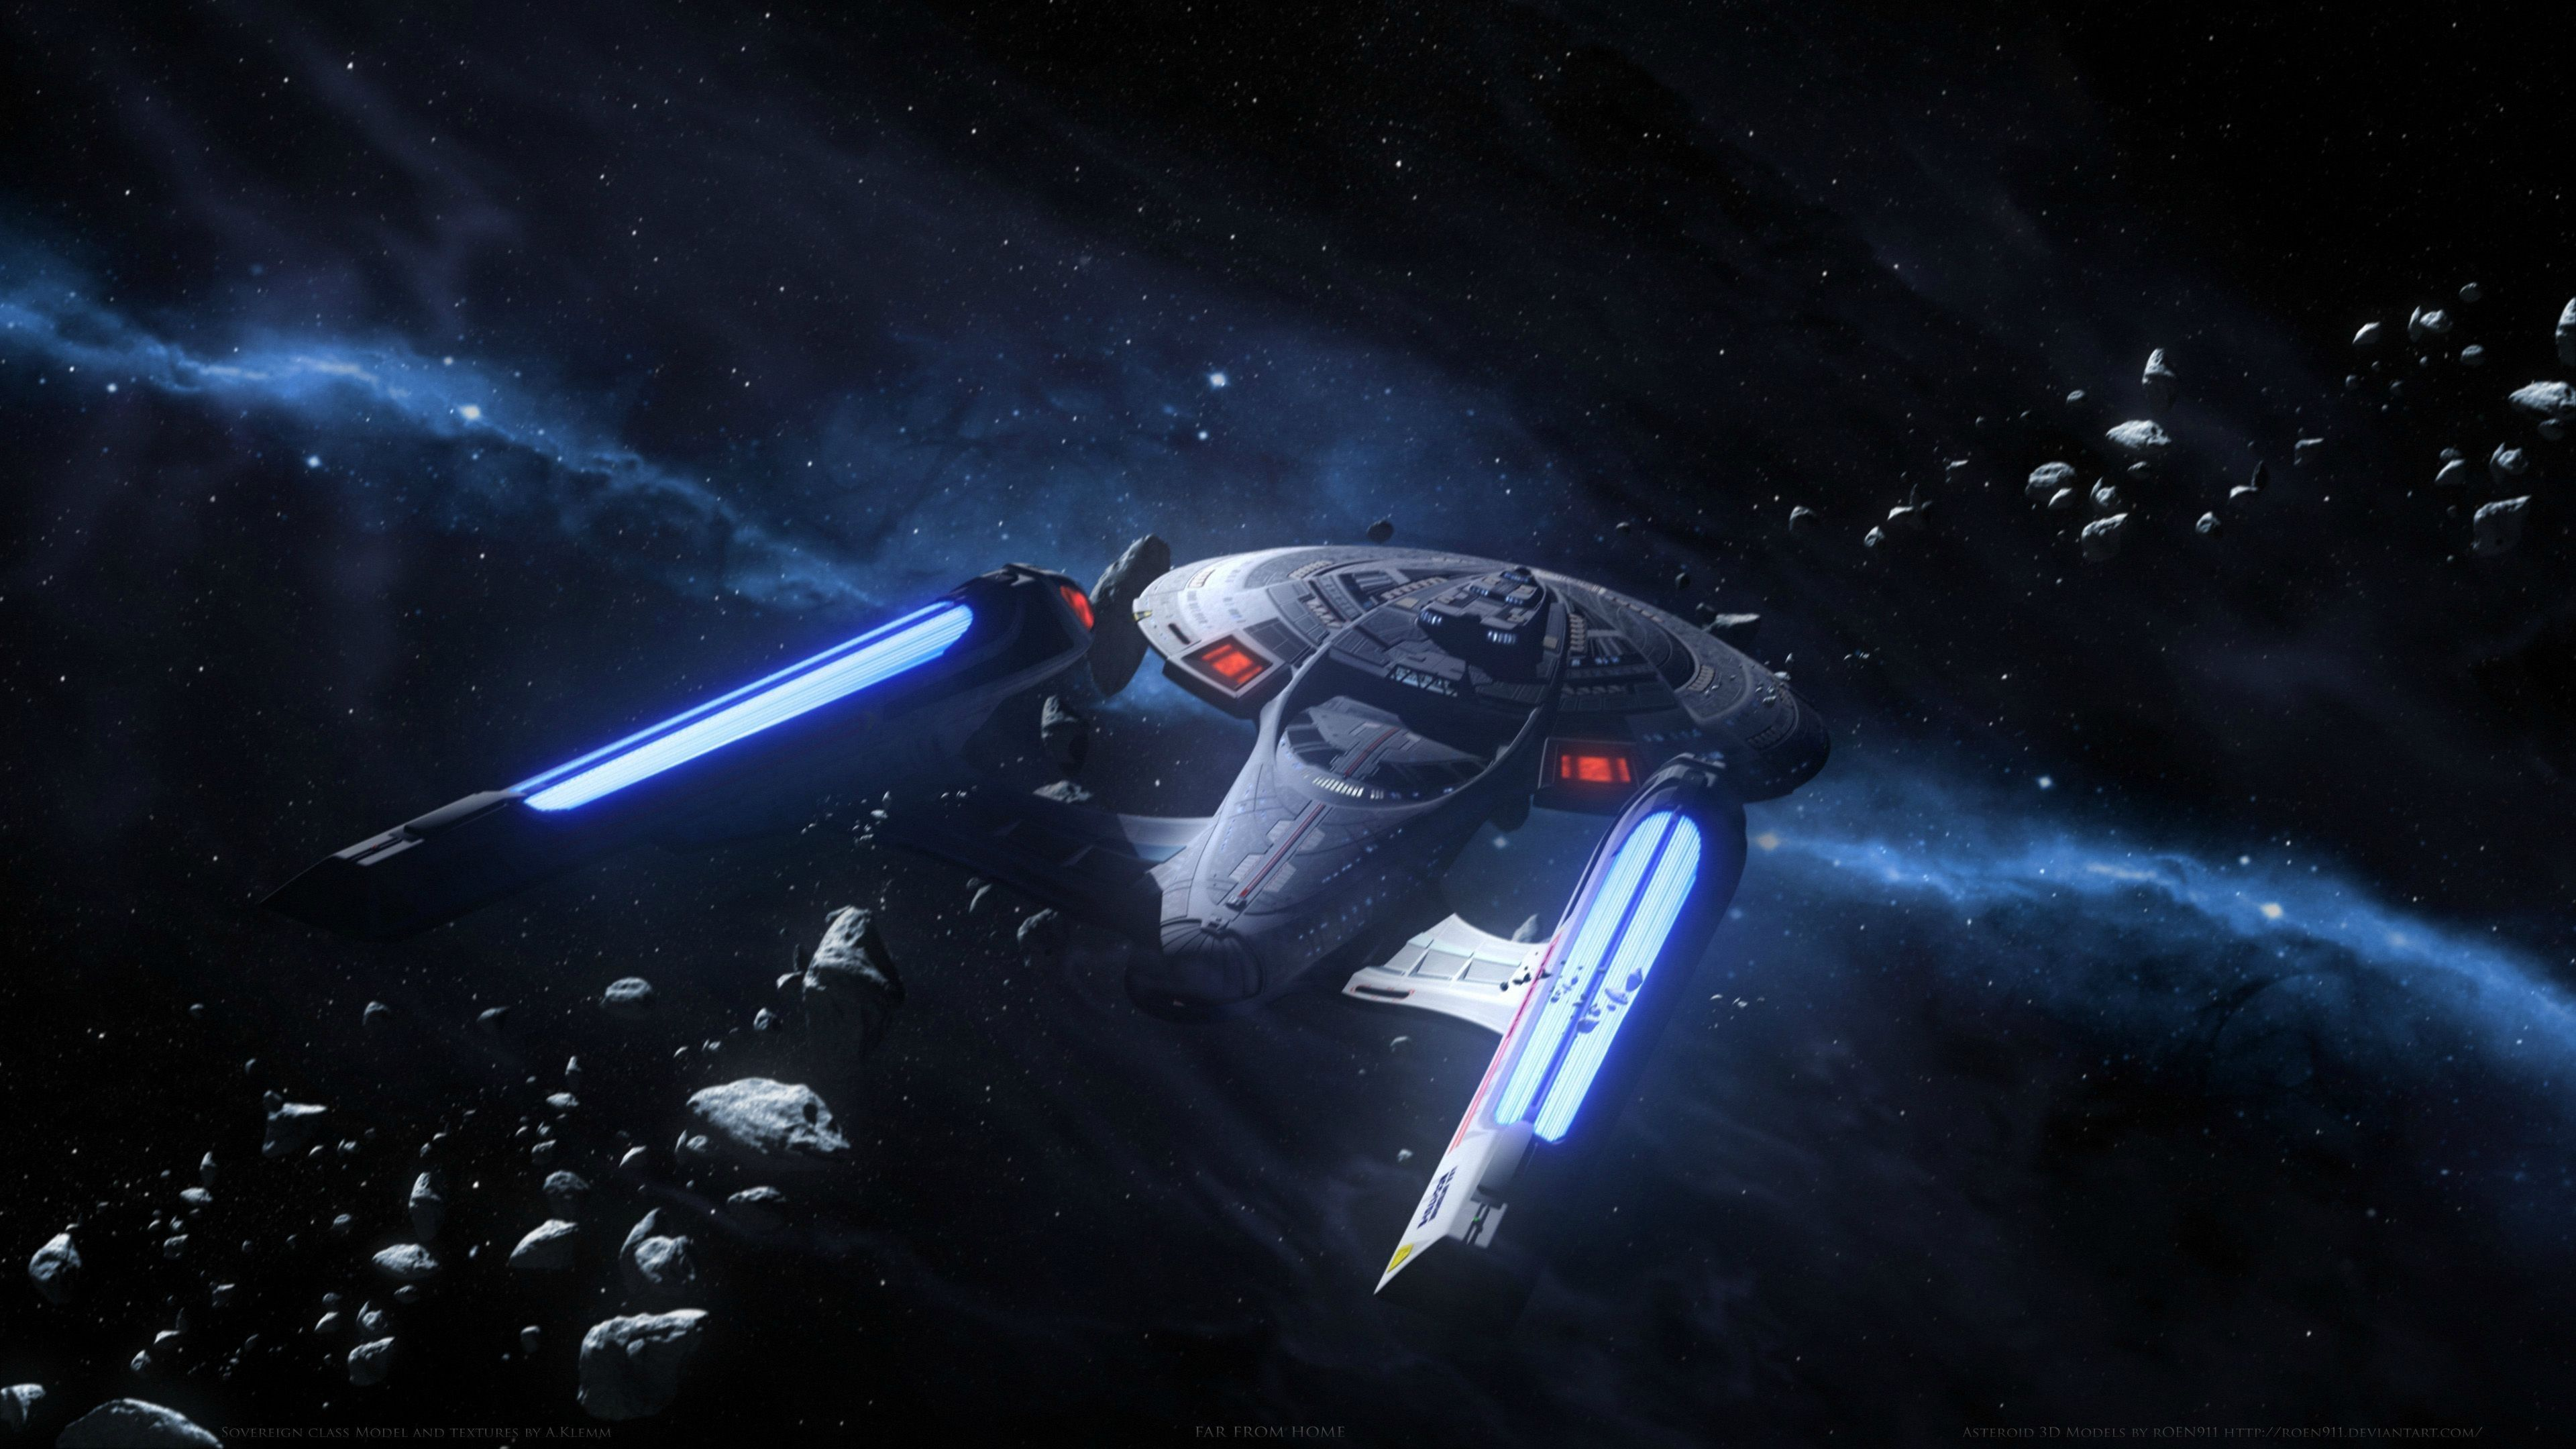 60 Starship Enterprise Wallpapers On Wallpaperplay Star